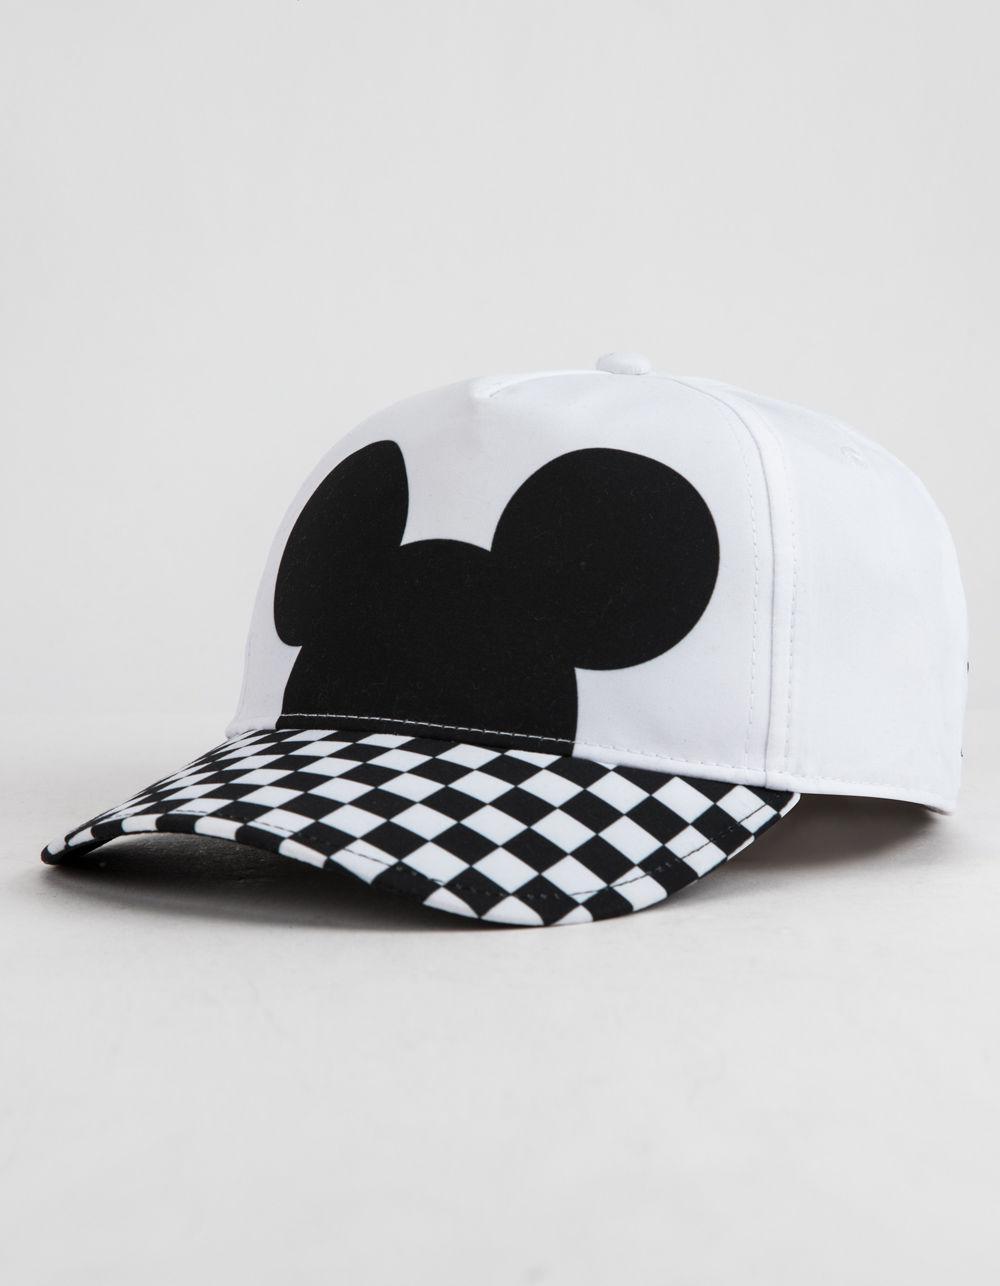 35c804f2d8c Lyst - Vans Disney X Checkerboard Mickey Womens Strapback Hat